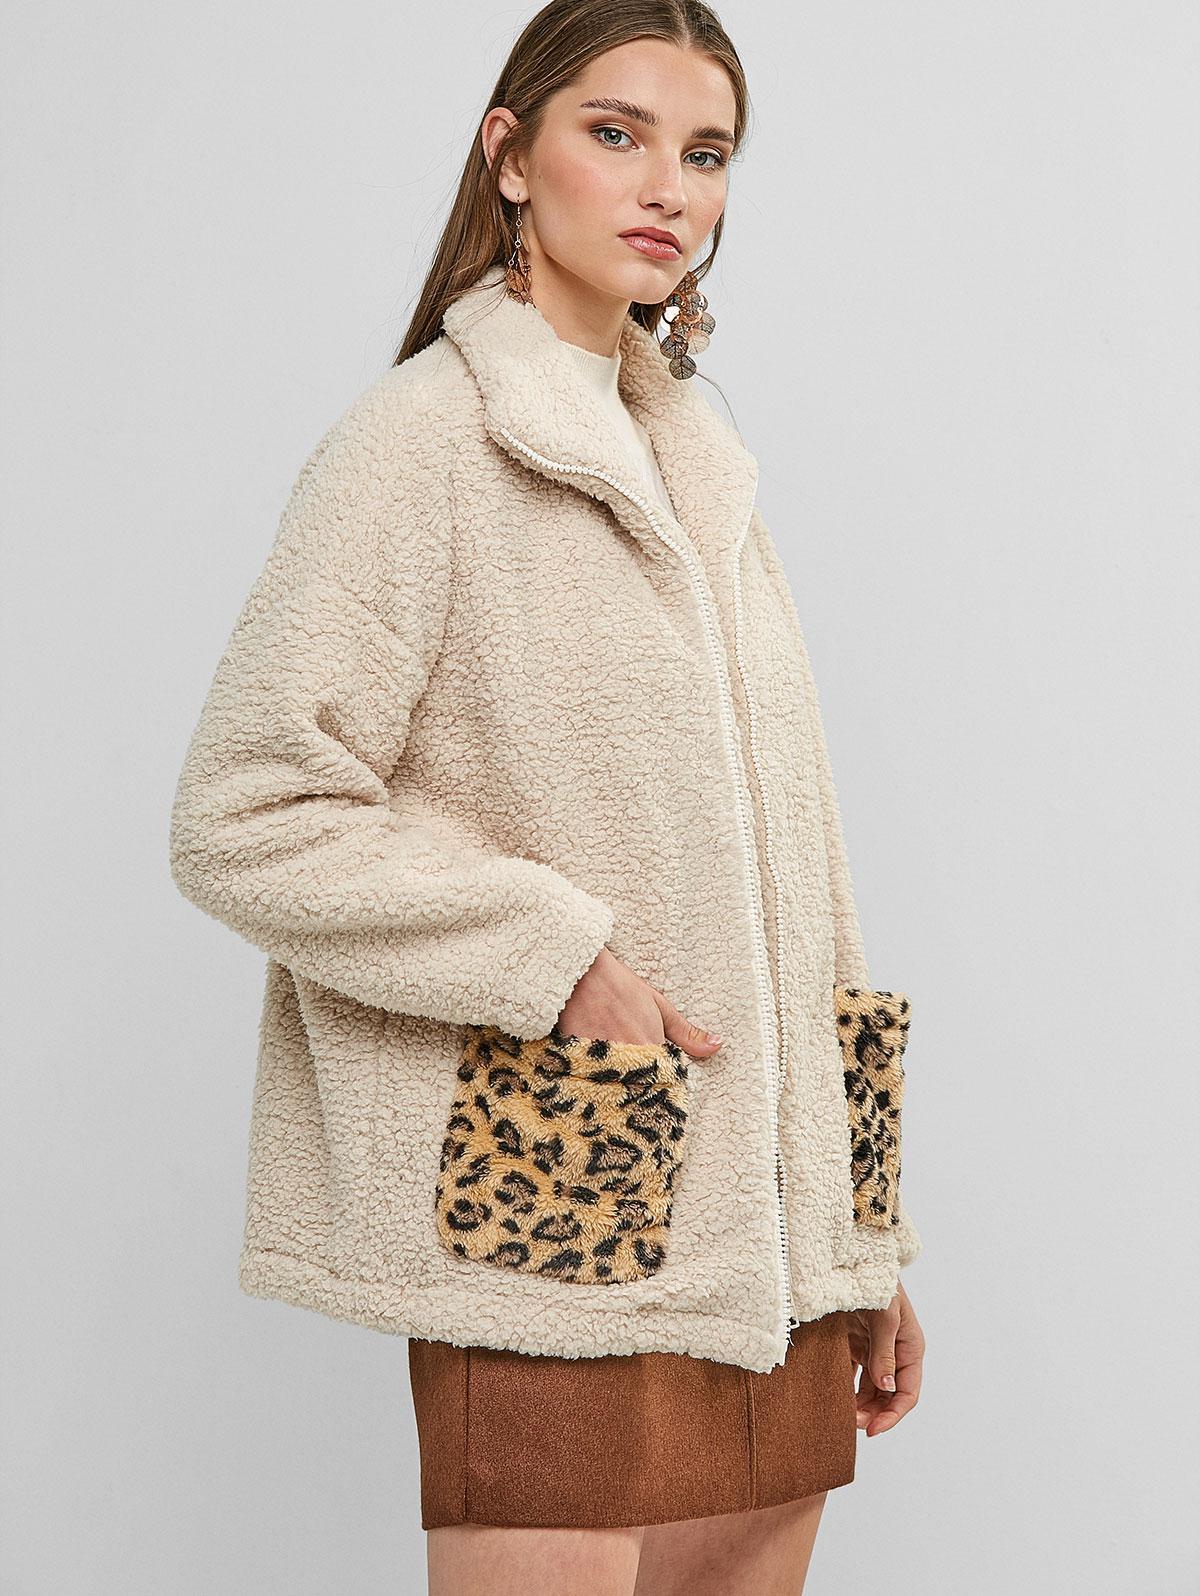 Zip Up Leopard Dual Pocket Teddy Jacket